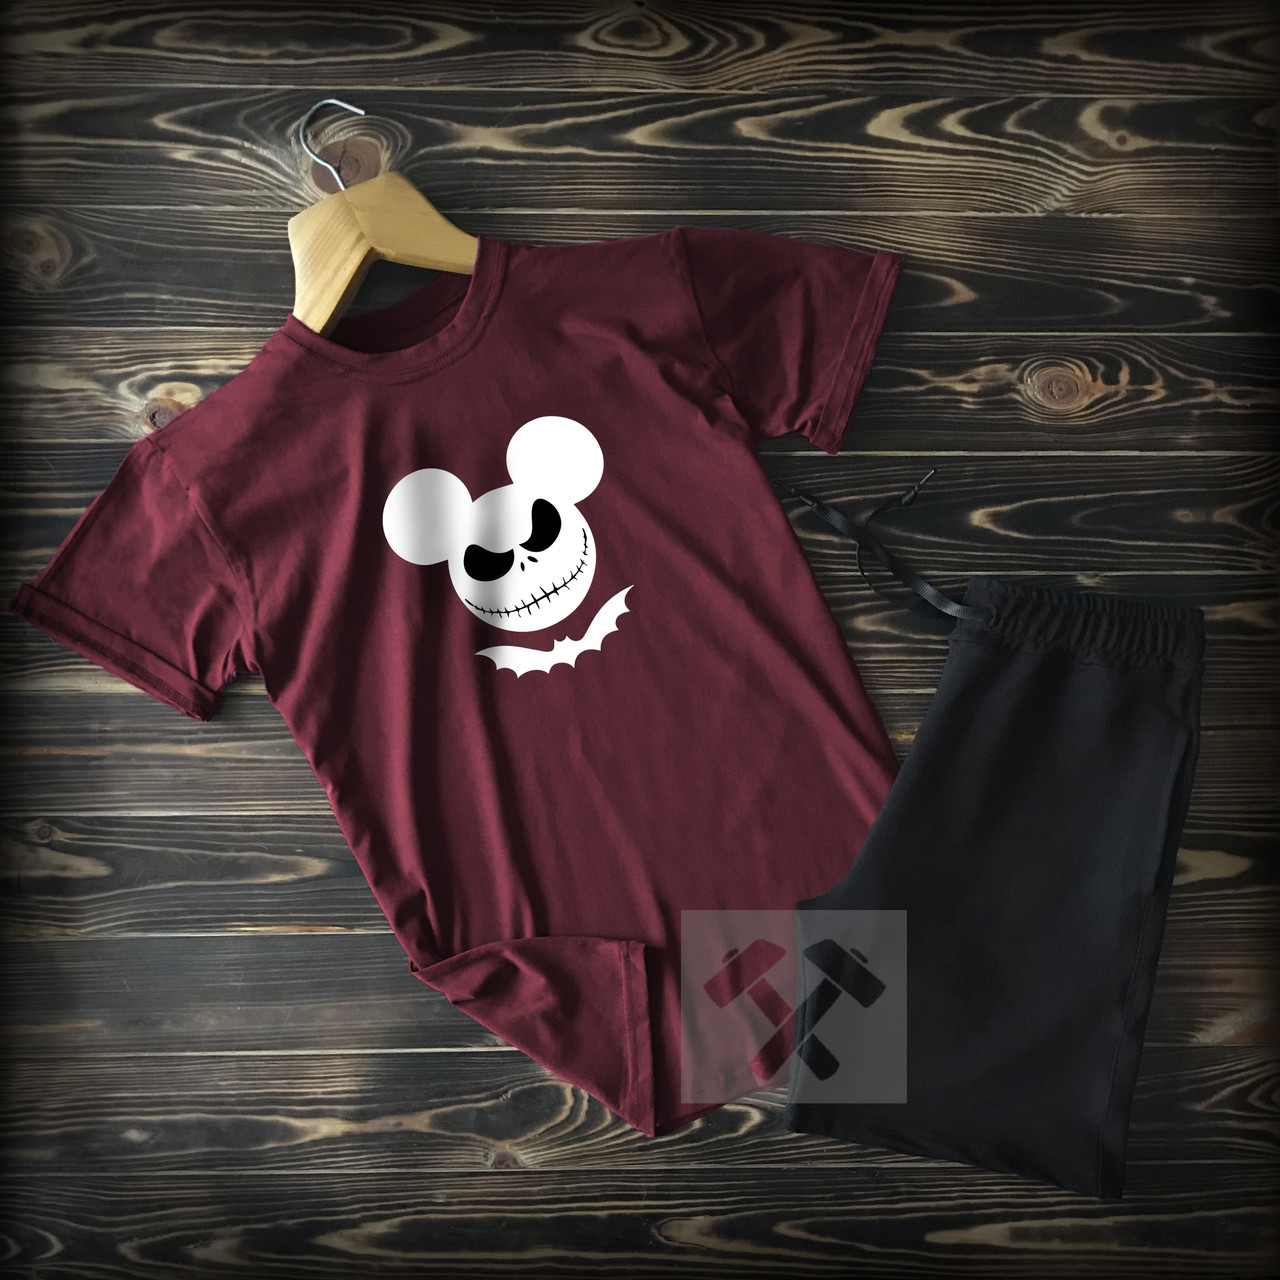 Летний спортивный костюм Микки Маус черно-бордового цвета